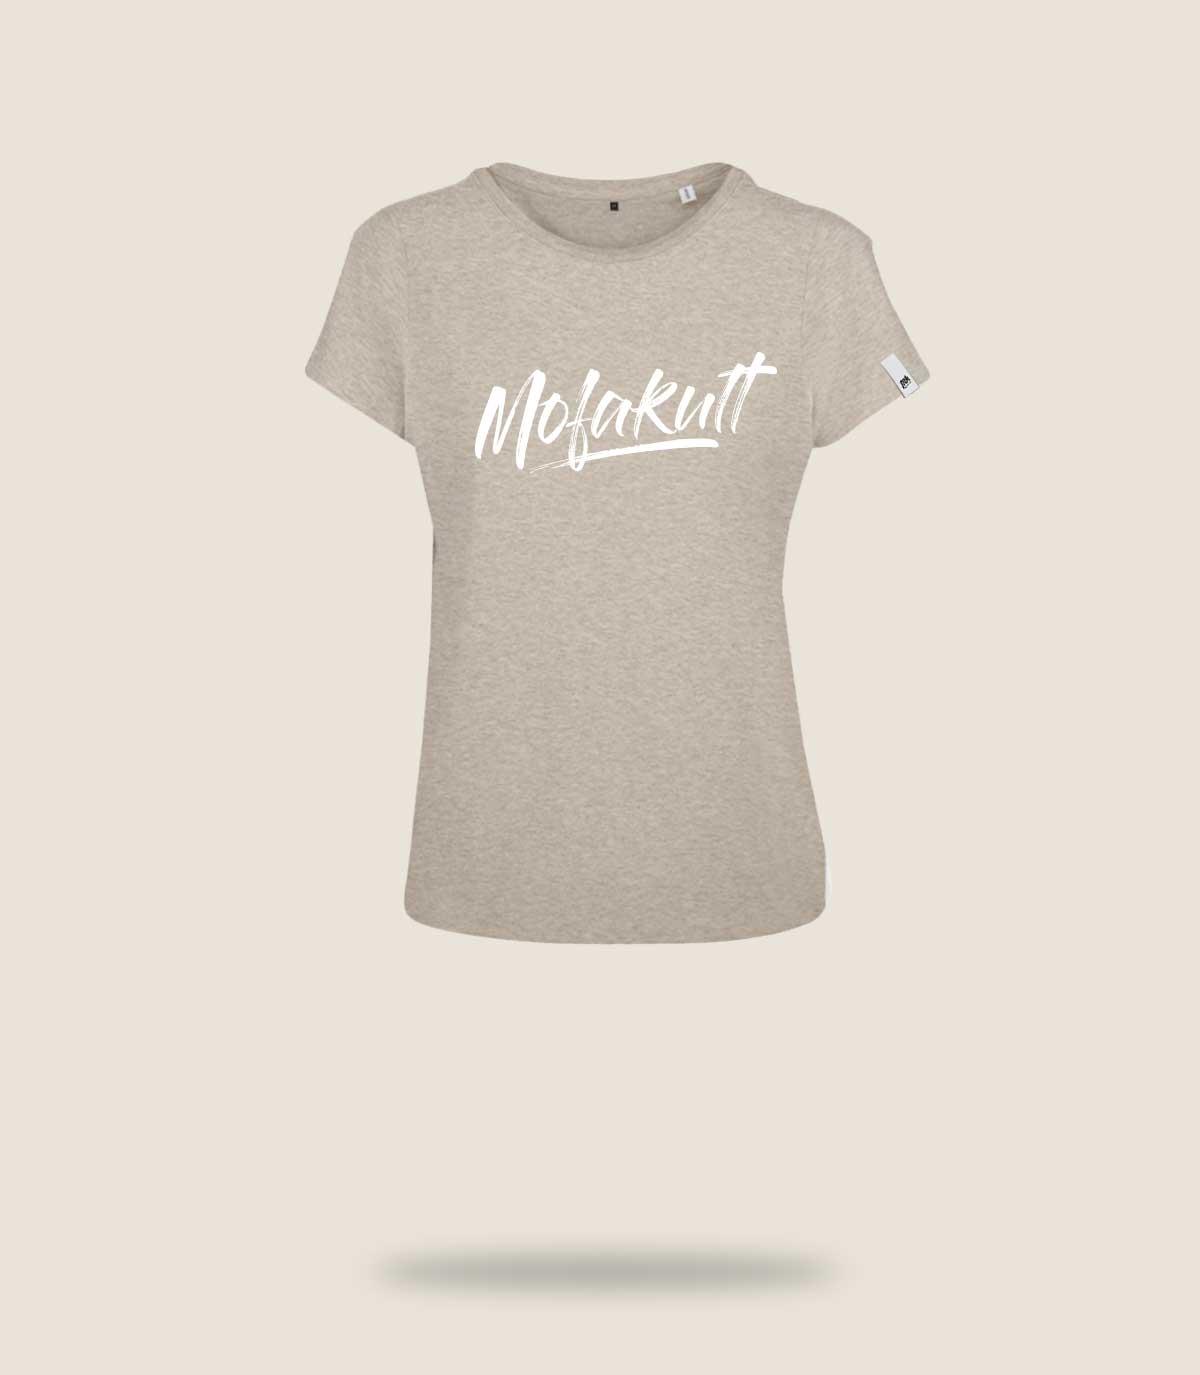 Mofakultwear Woman Shirt Sand